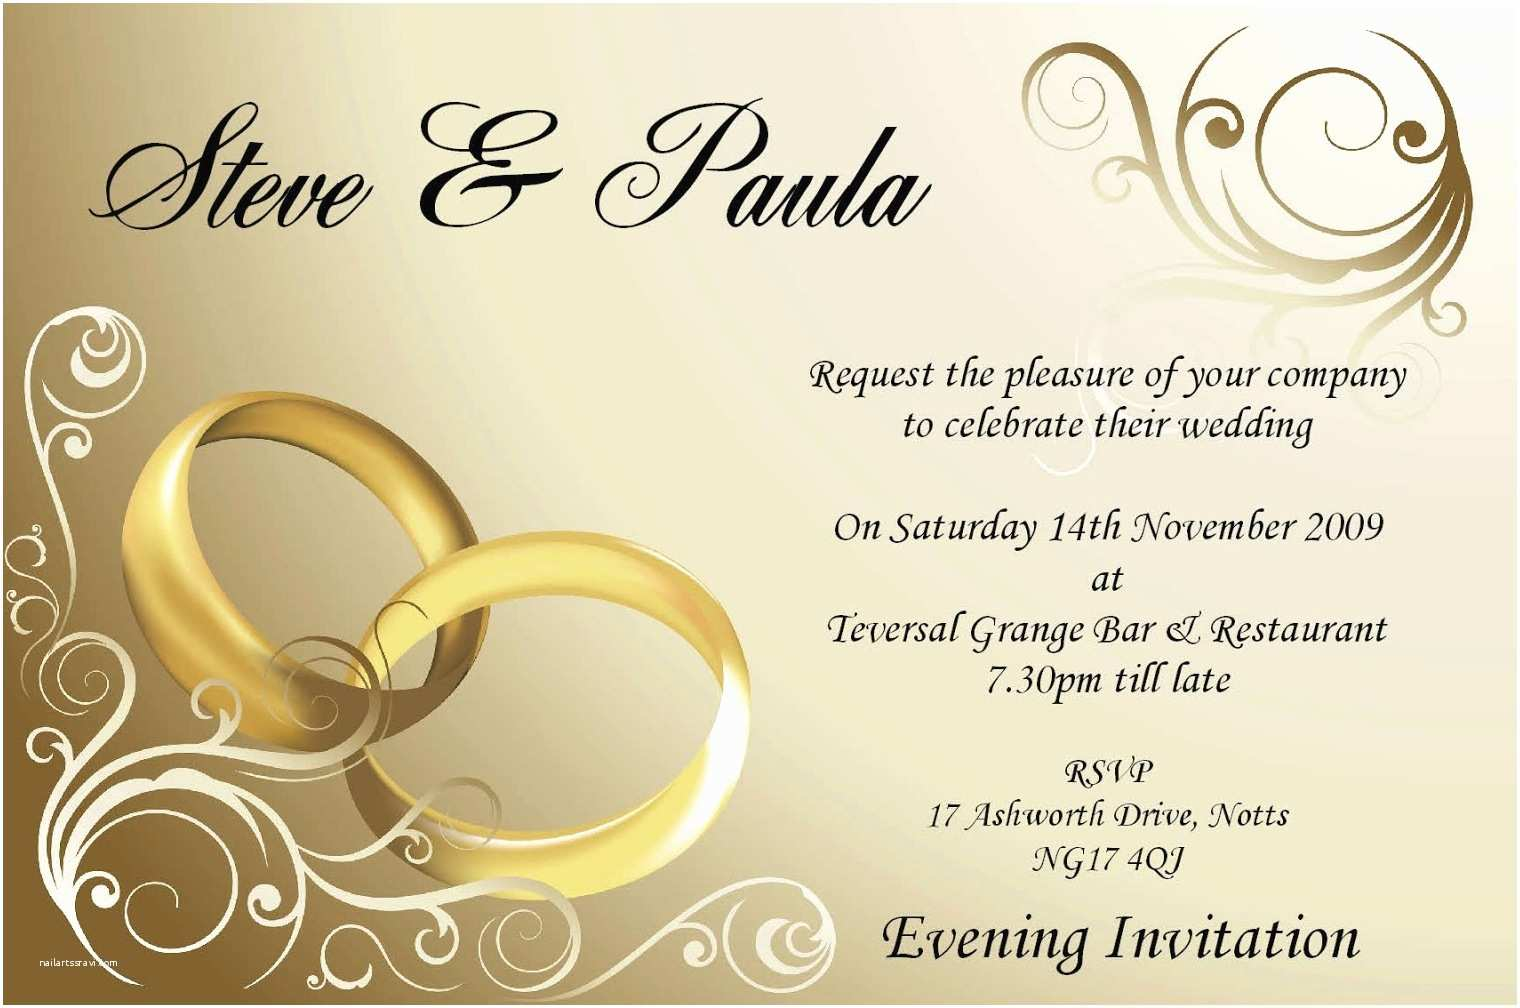 Wedding Invitation Card Ideas Wedding Day Quotes for Card Invitation